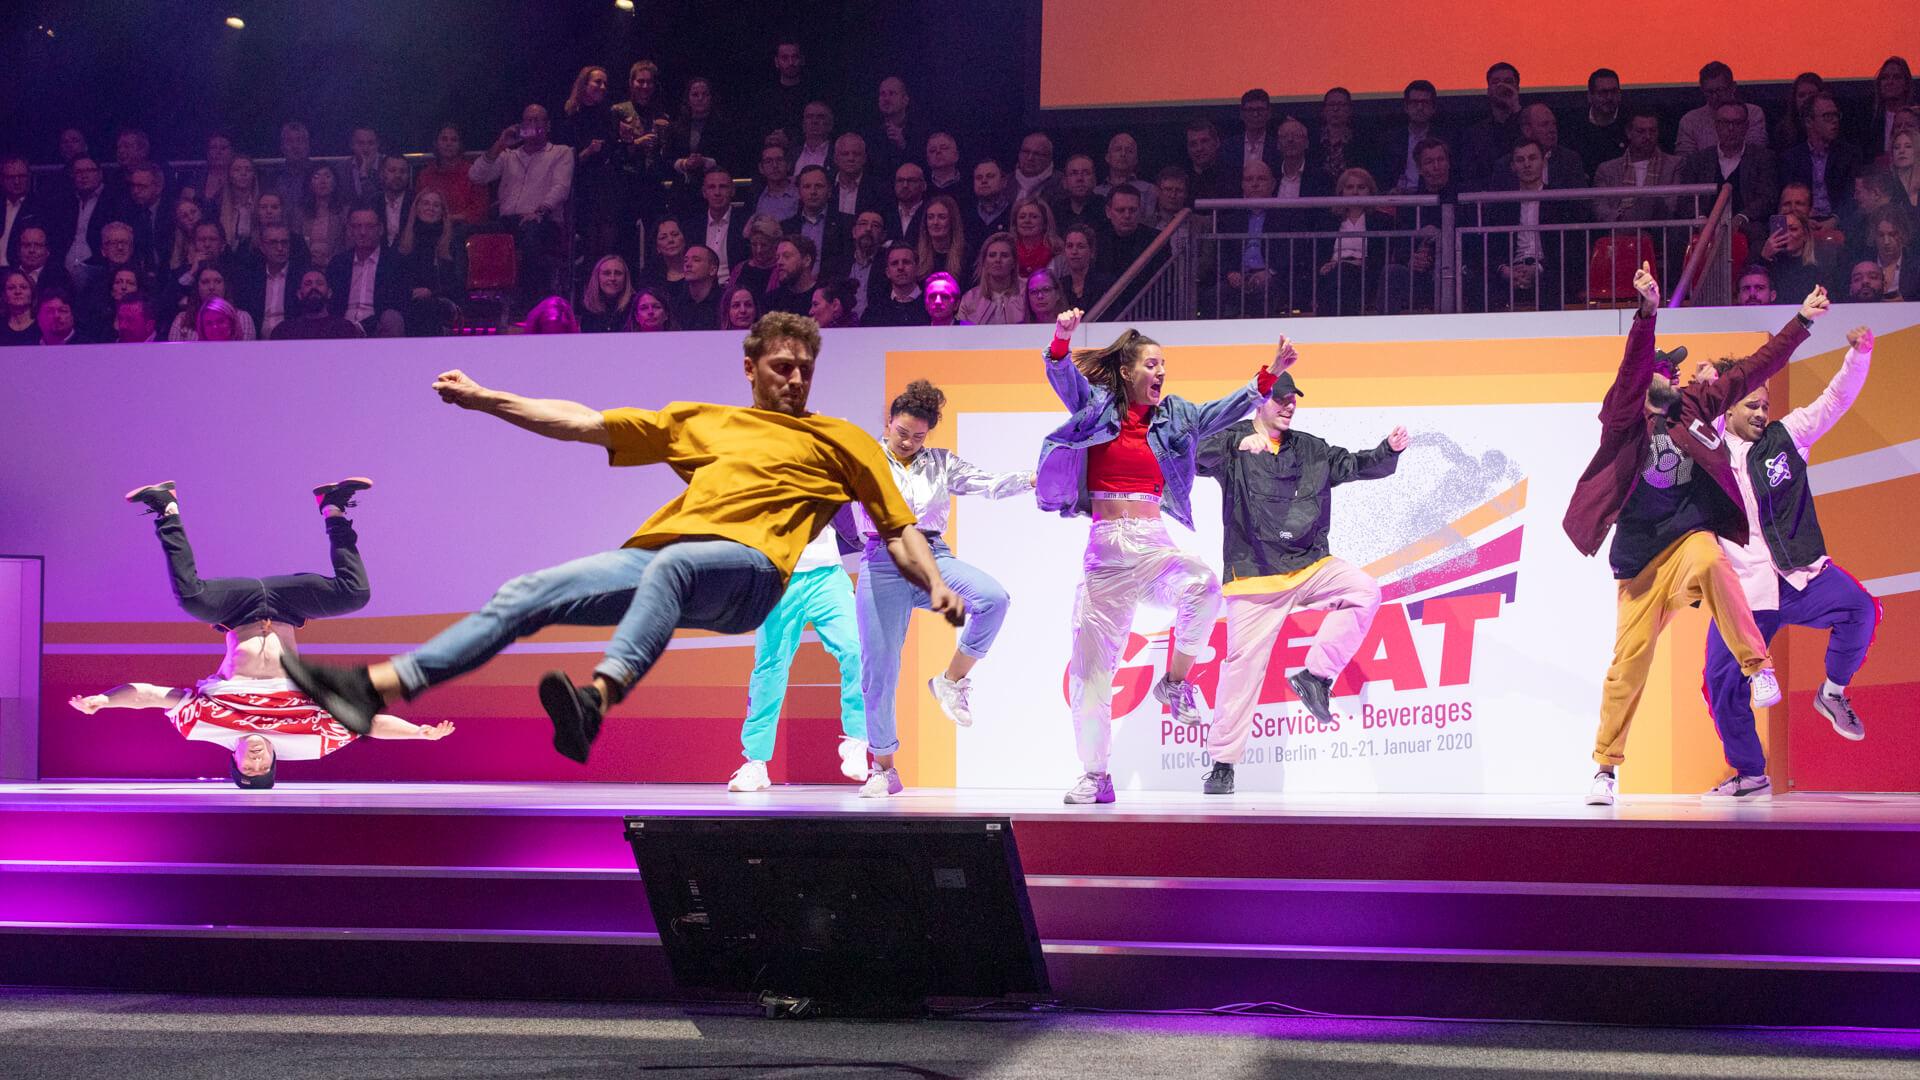 kick-off-event